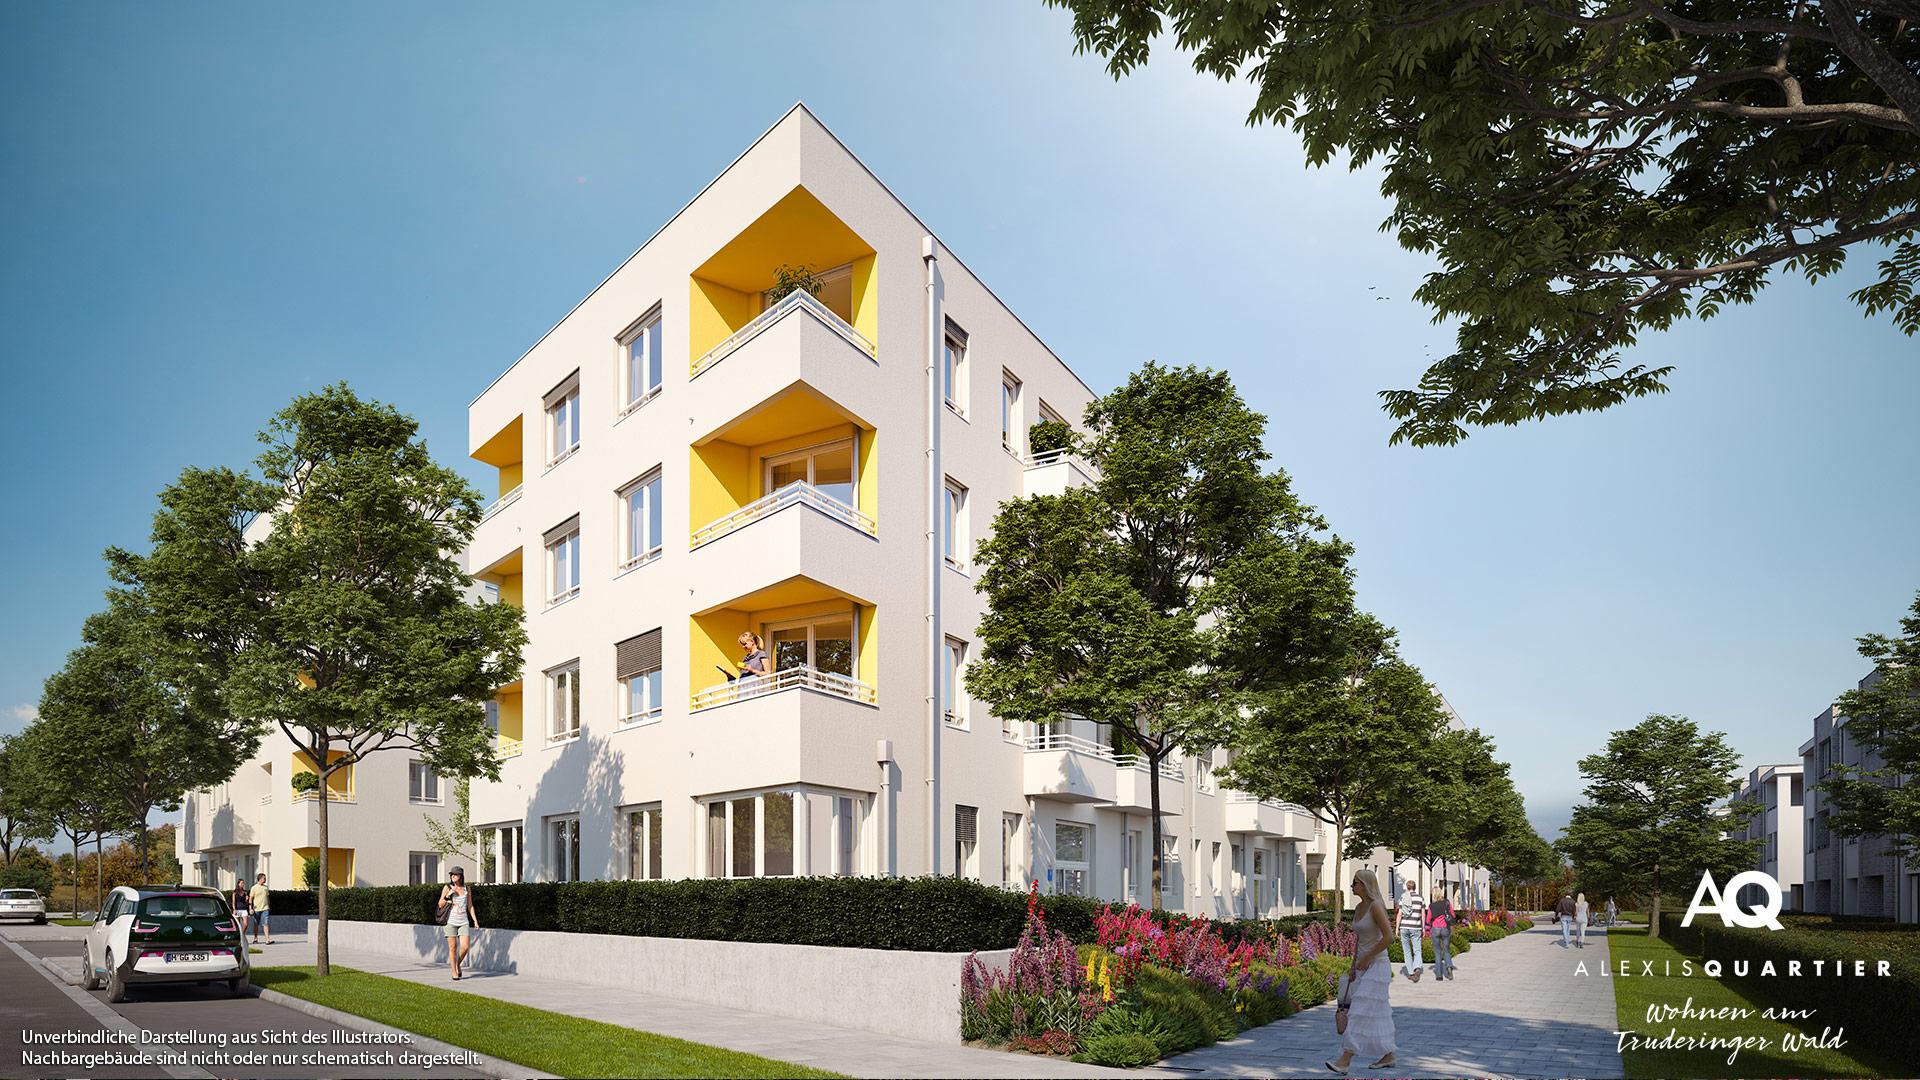 Immobilie Alexisquartier - Wohnen am Truderinger Wald - Illustration 3